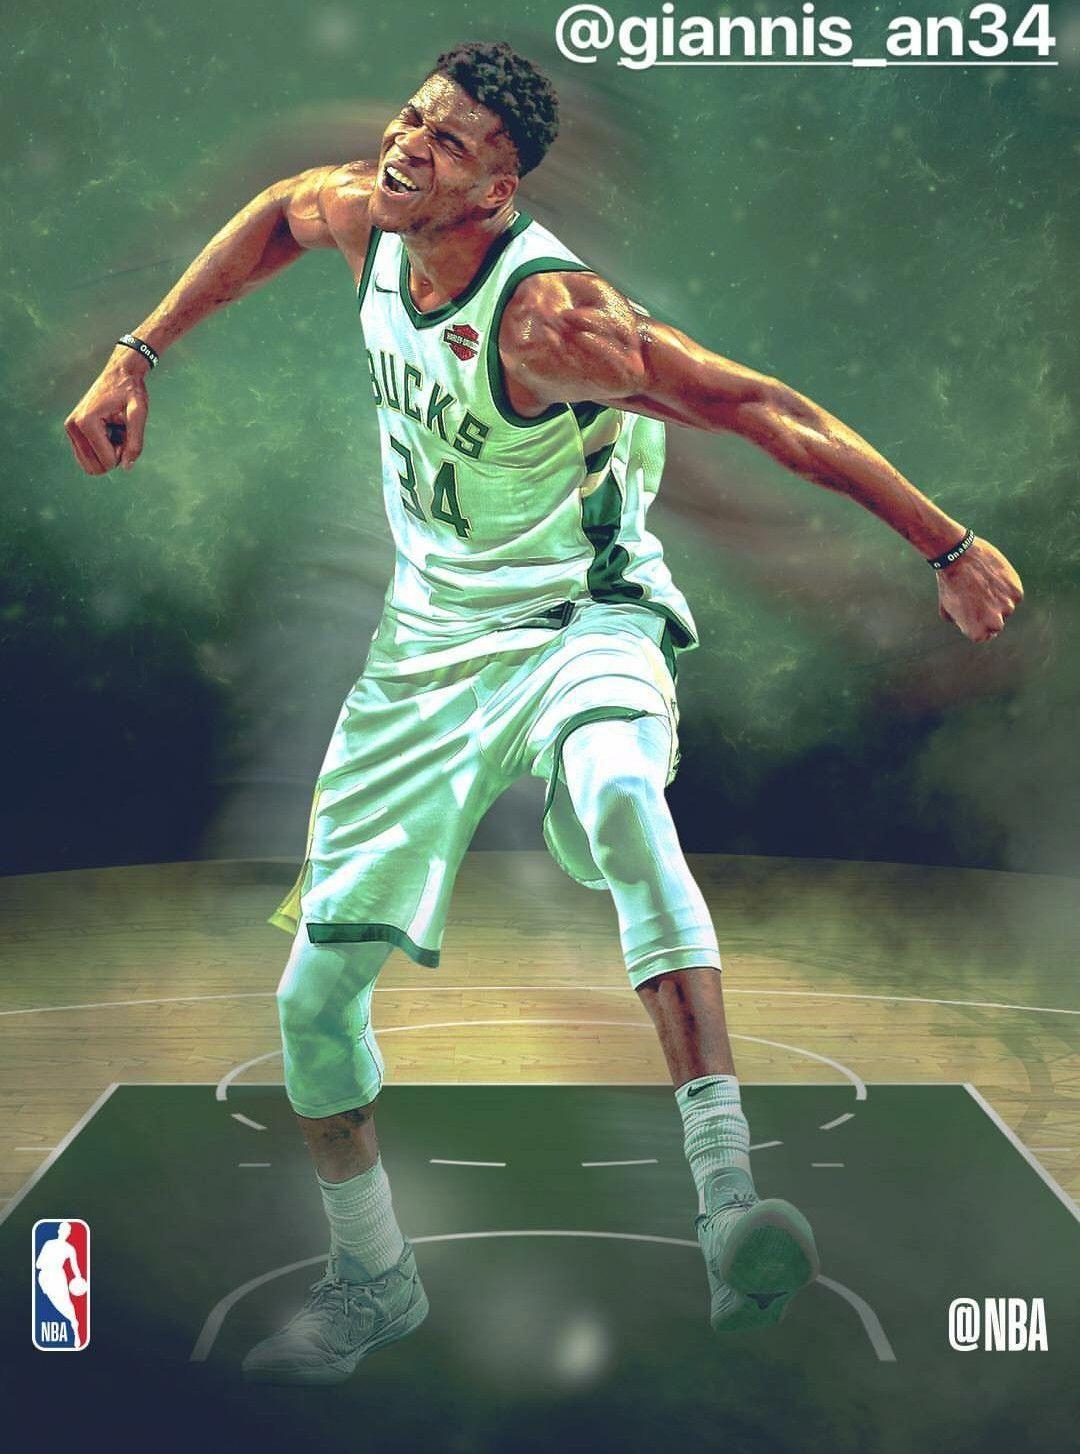 Giannis Antetokounmpo Interestingsportsmemes Basketball Workouts Basketball Players Nba Basketball Photos